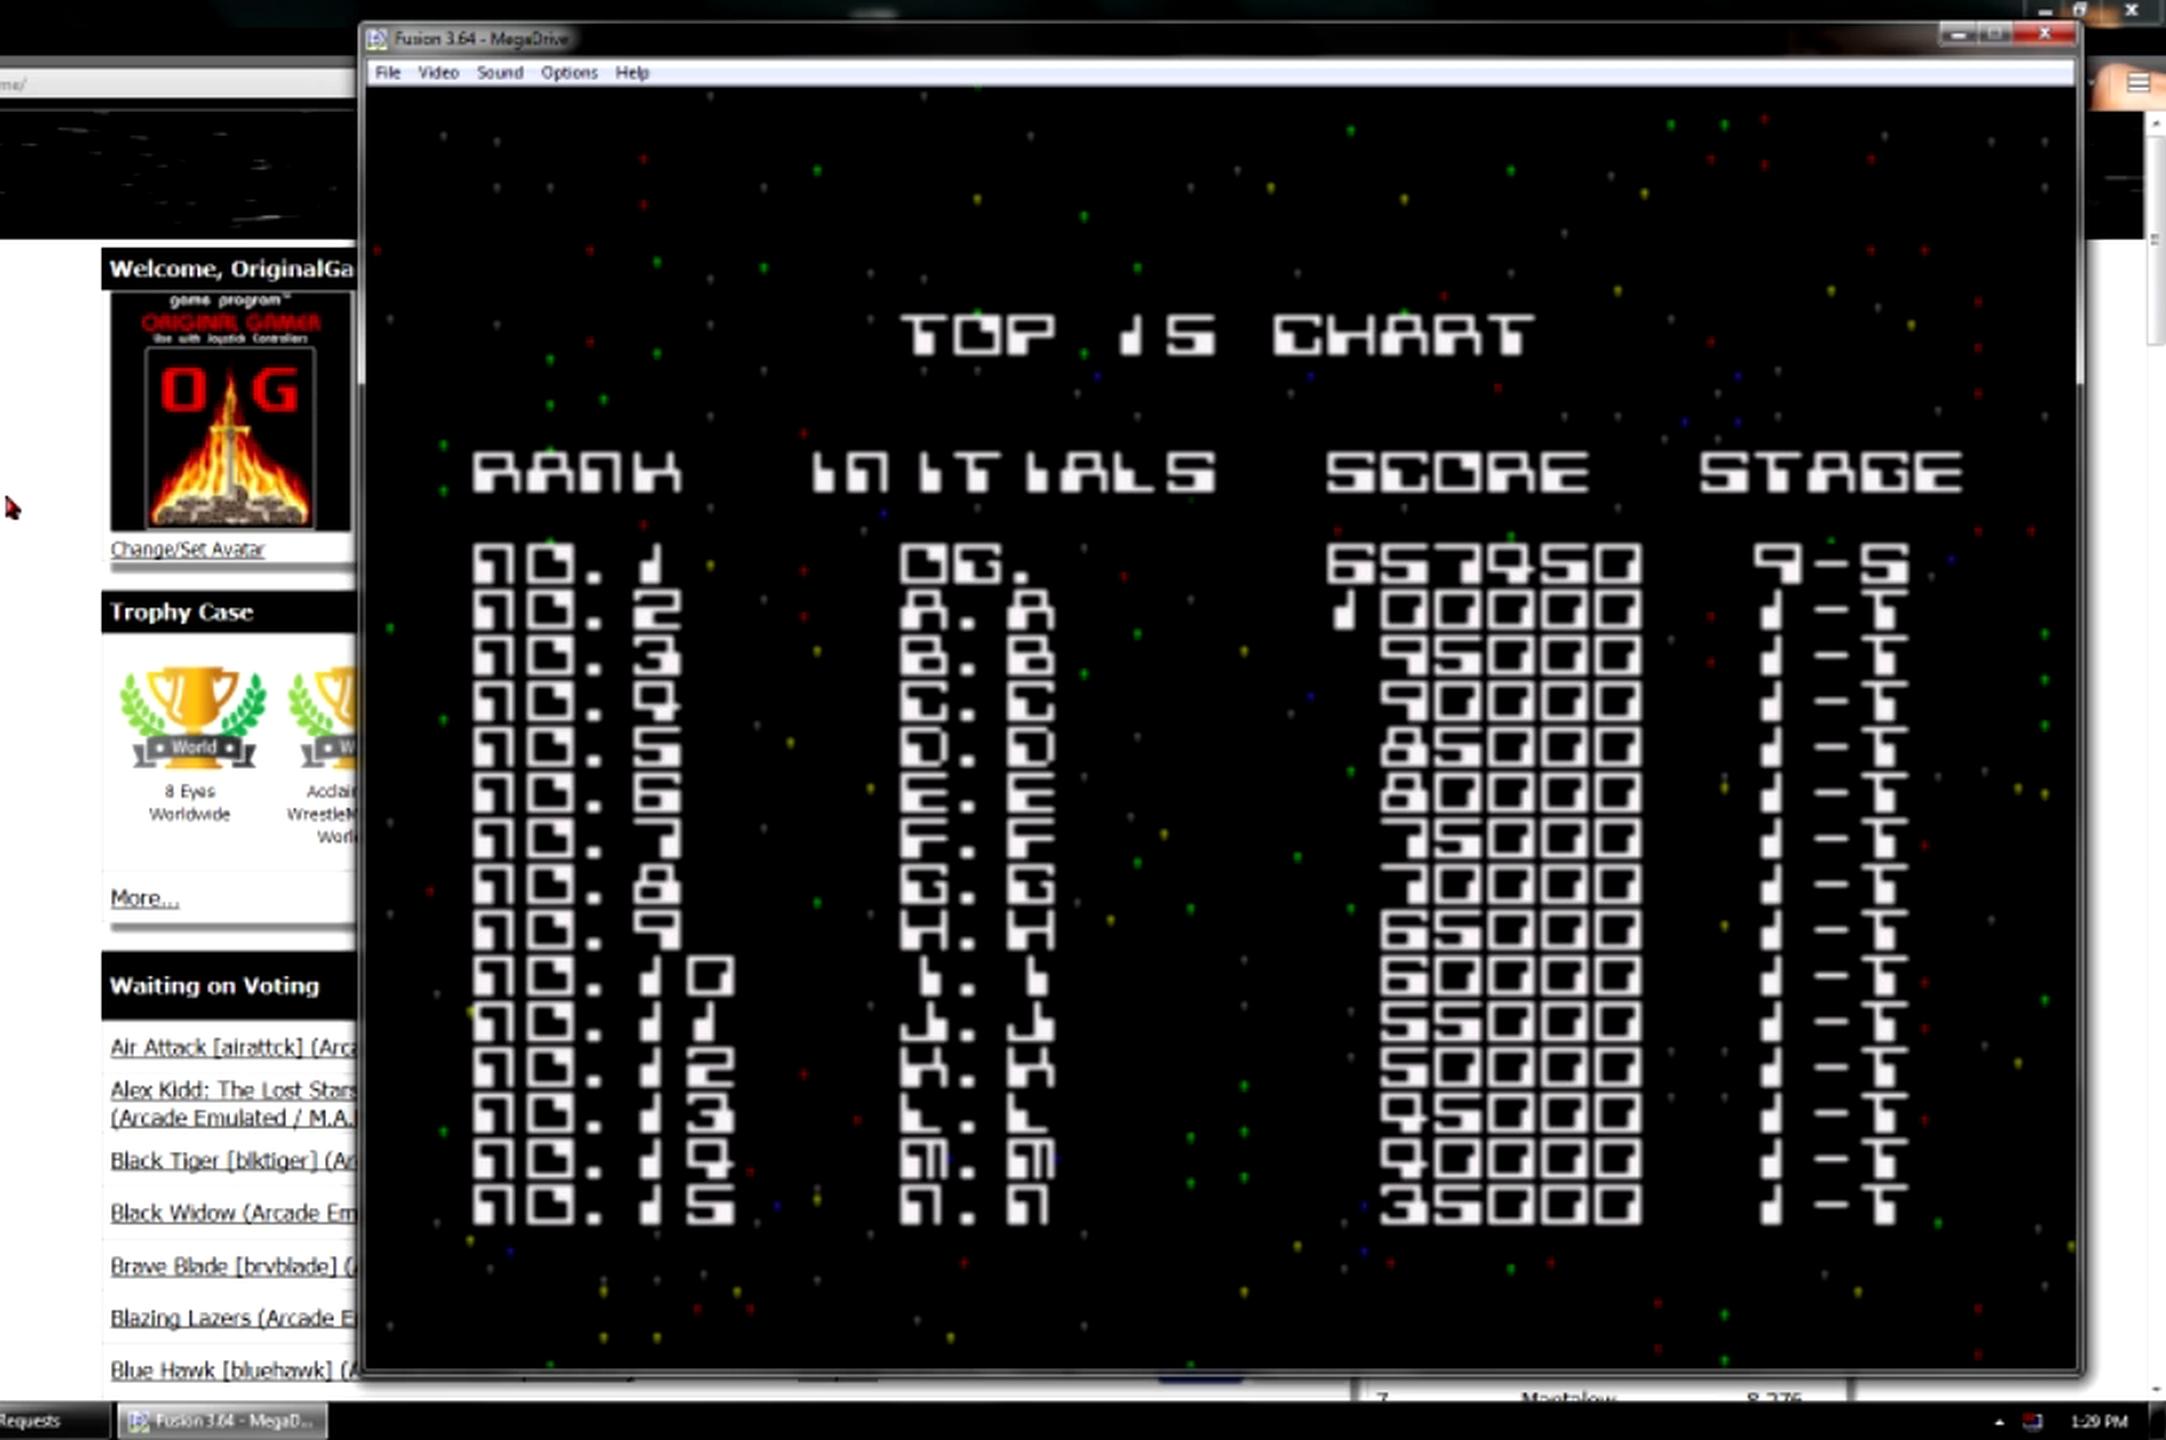 OriginalGamer: Dangerous Seed [Normal] (Sega Genesis / MegaDrive Emulated) 657,450 points on 2015-06-08 23:20:17